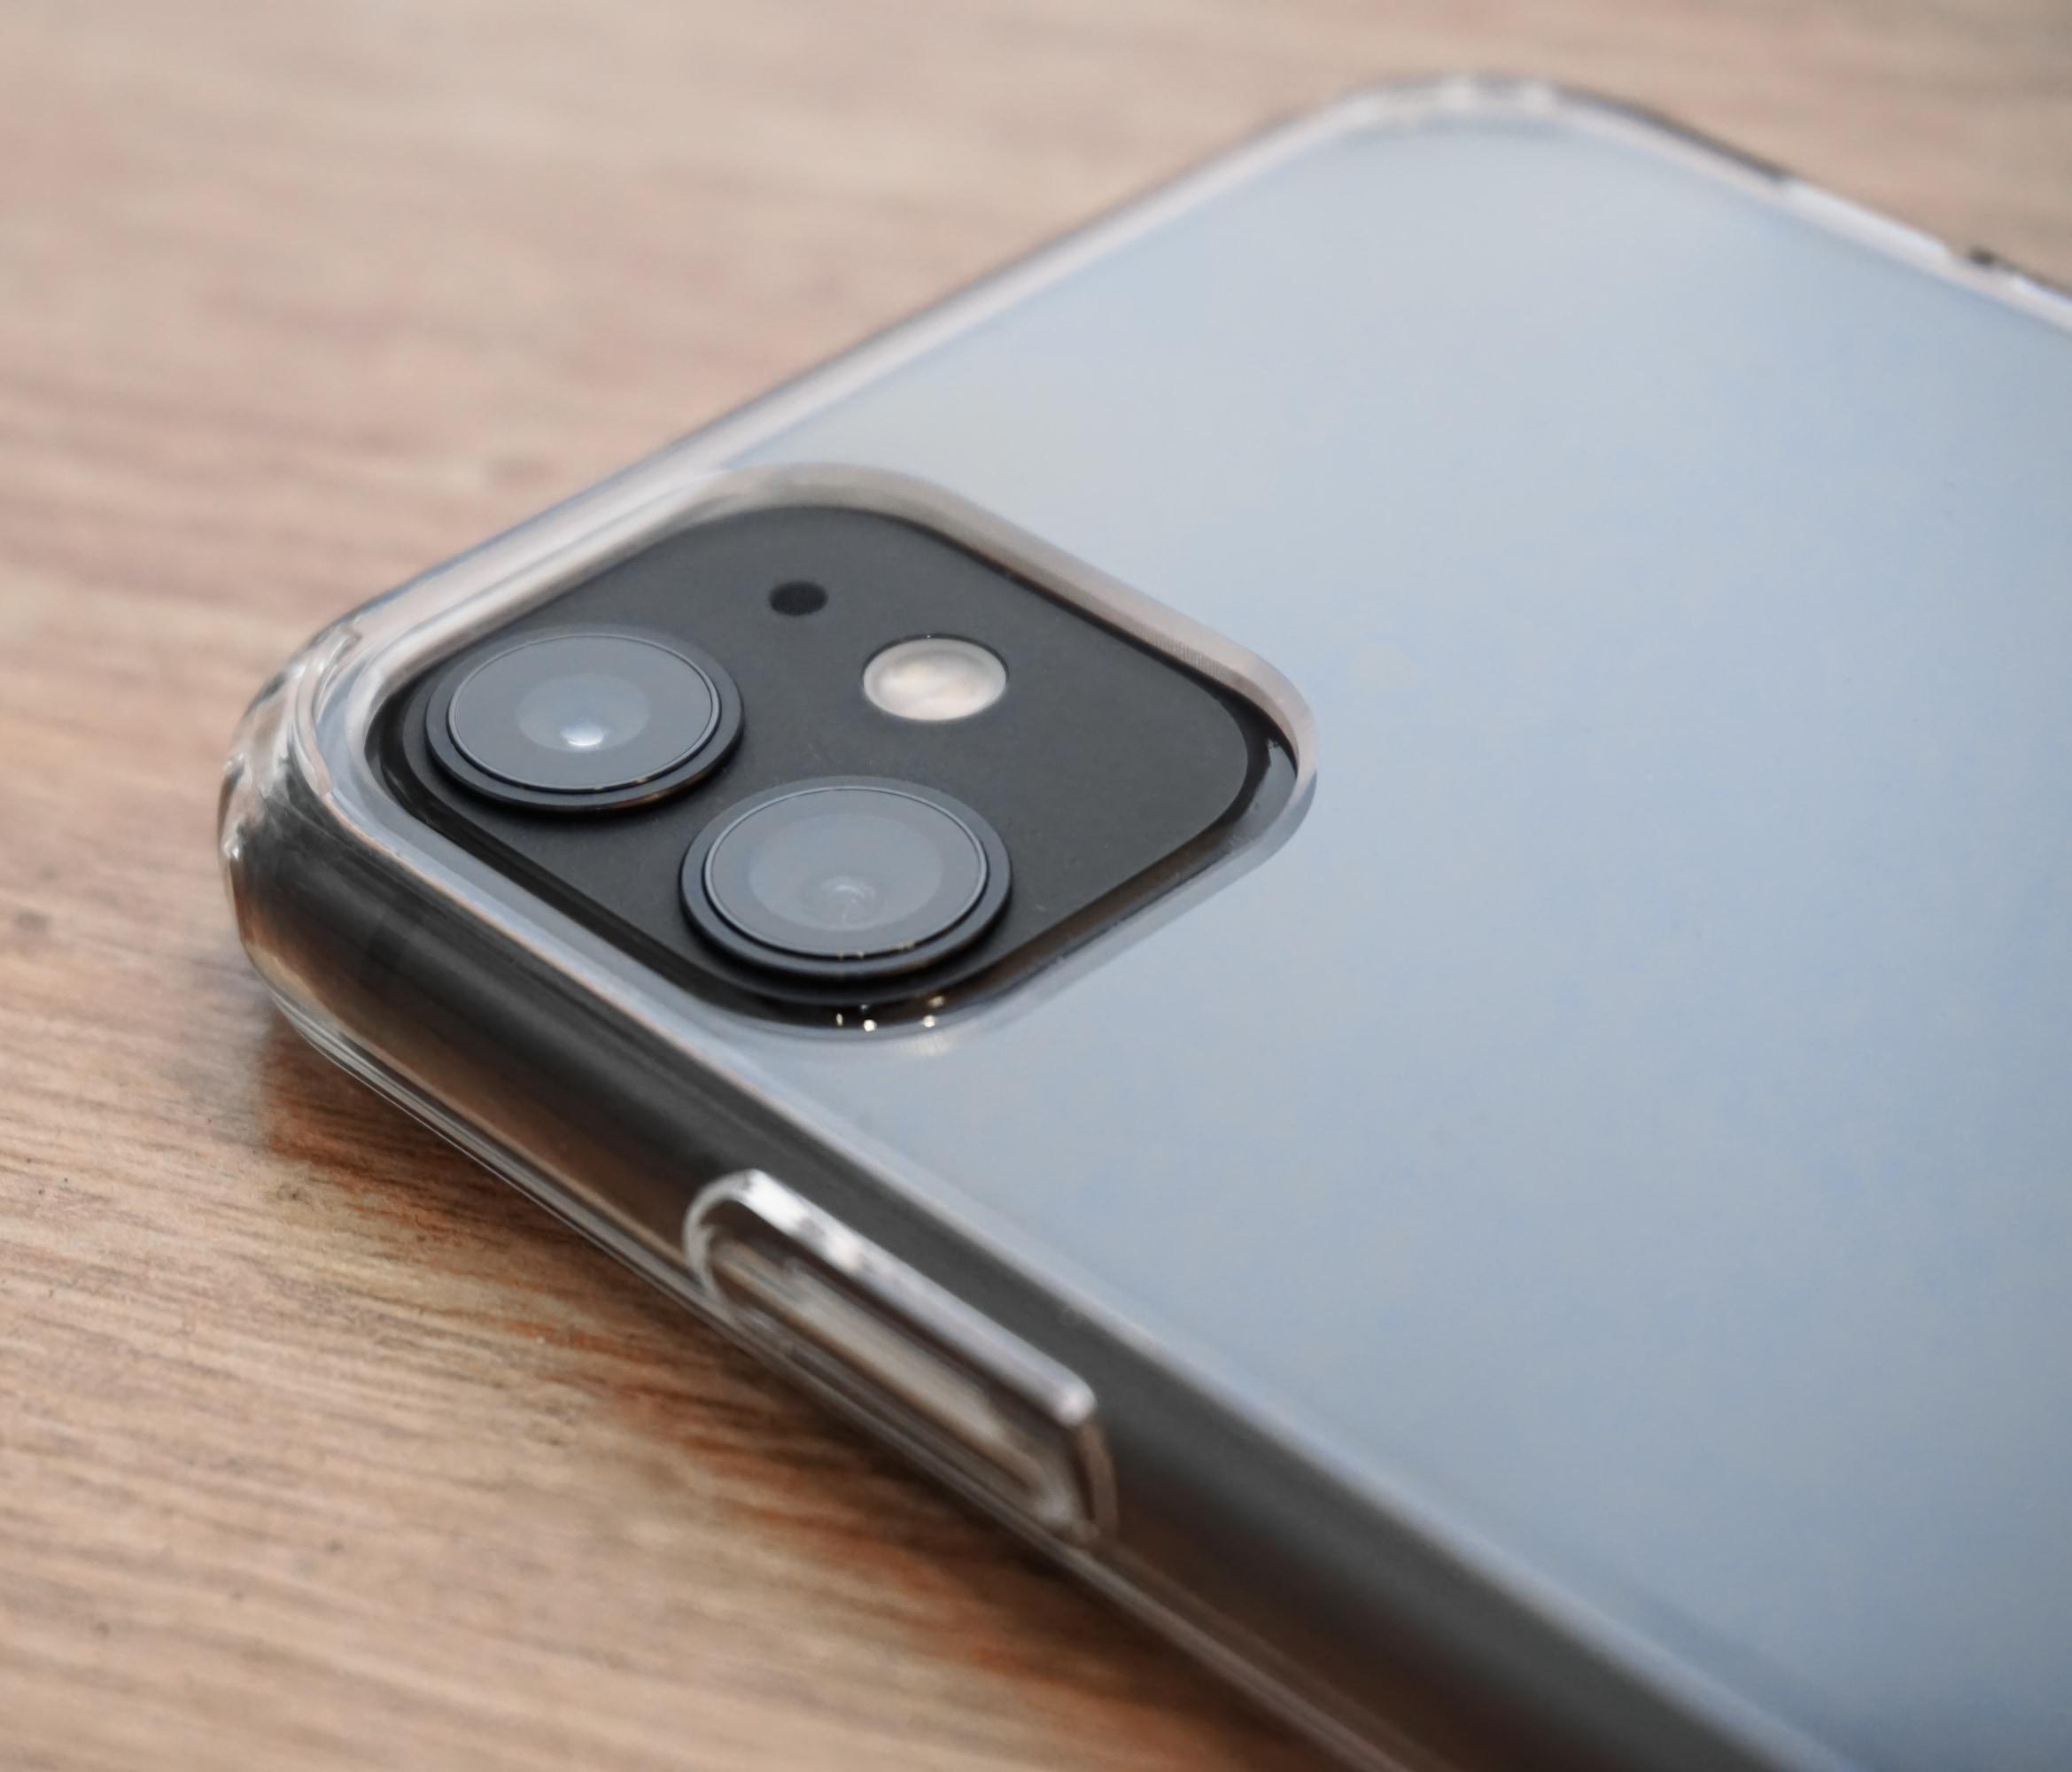 כיסוי ל iPhone 11 אייפון 11